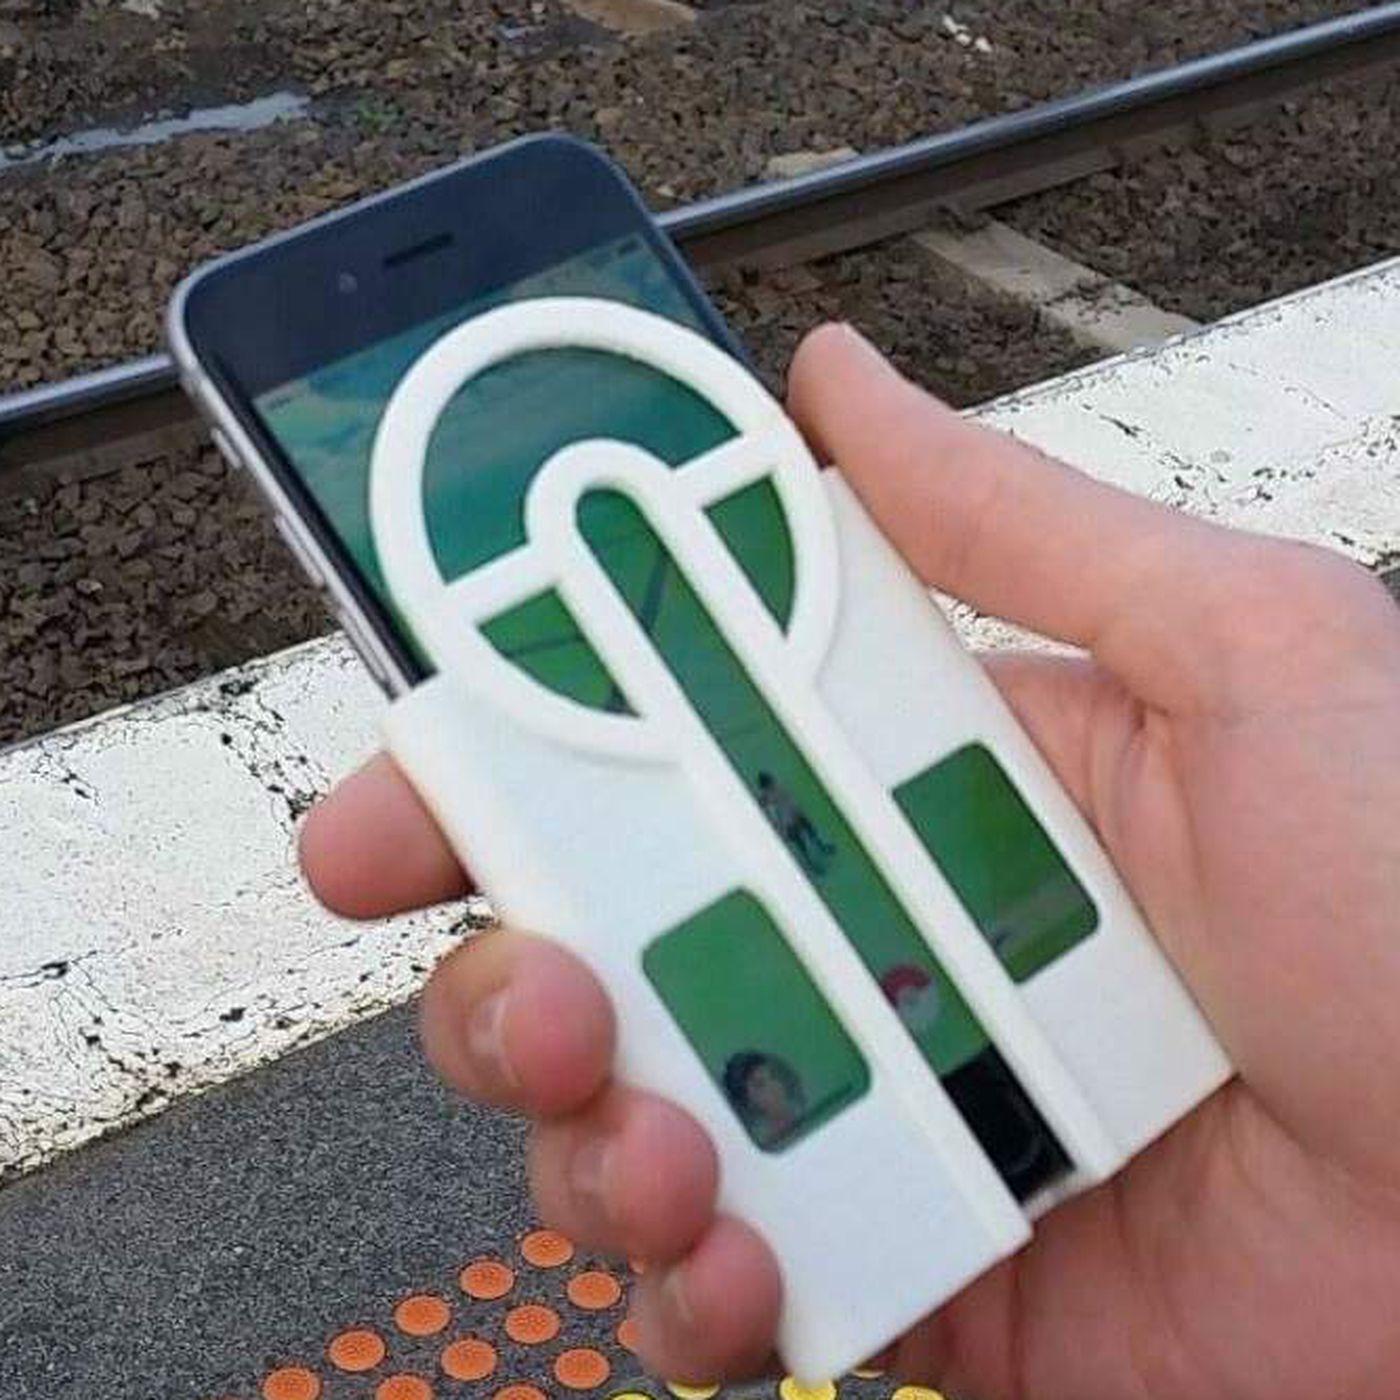 online retailer 9ff5b 4b333 Someone made a phone case that helps aim pokéballs - The Verge